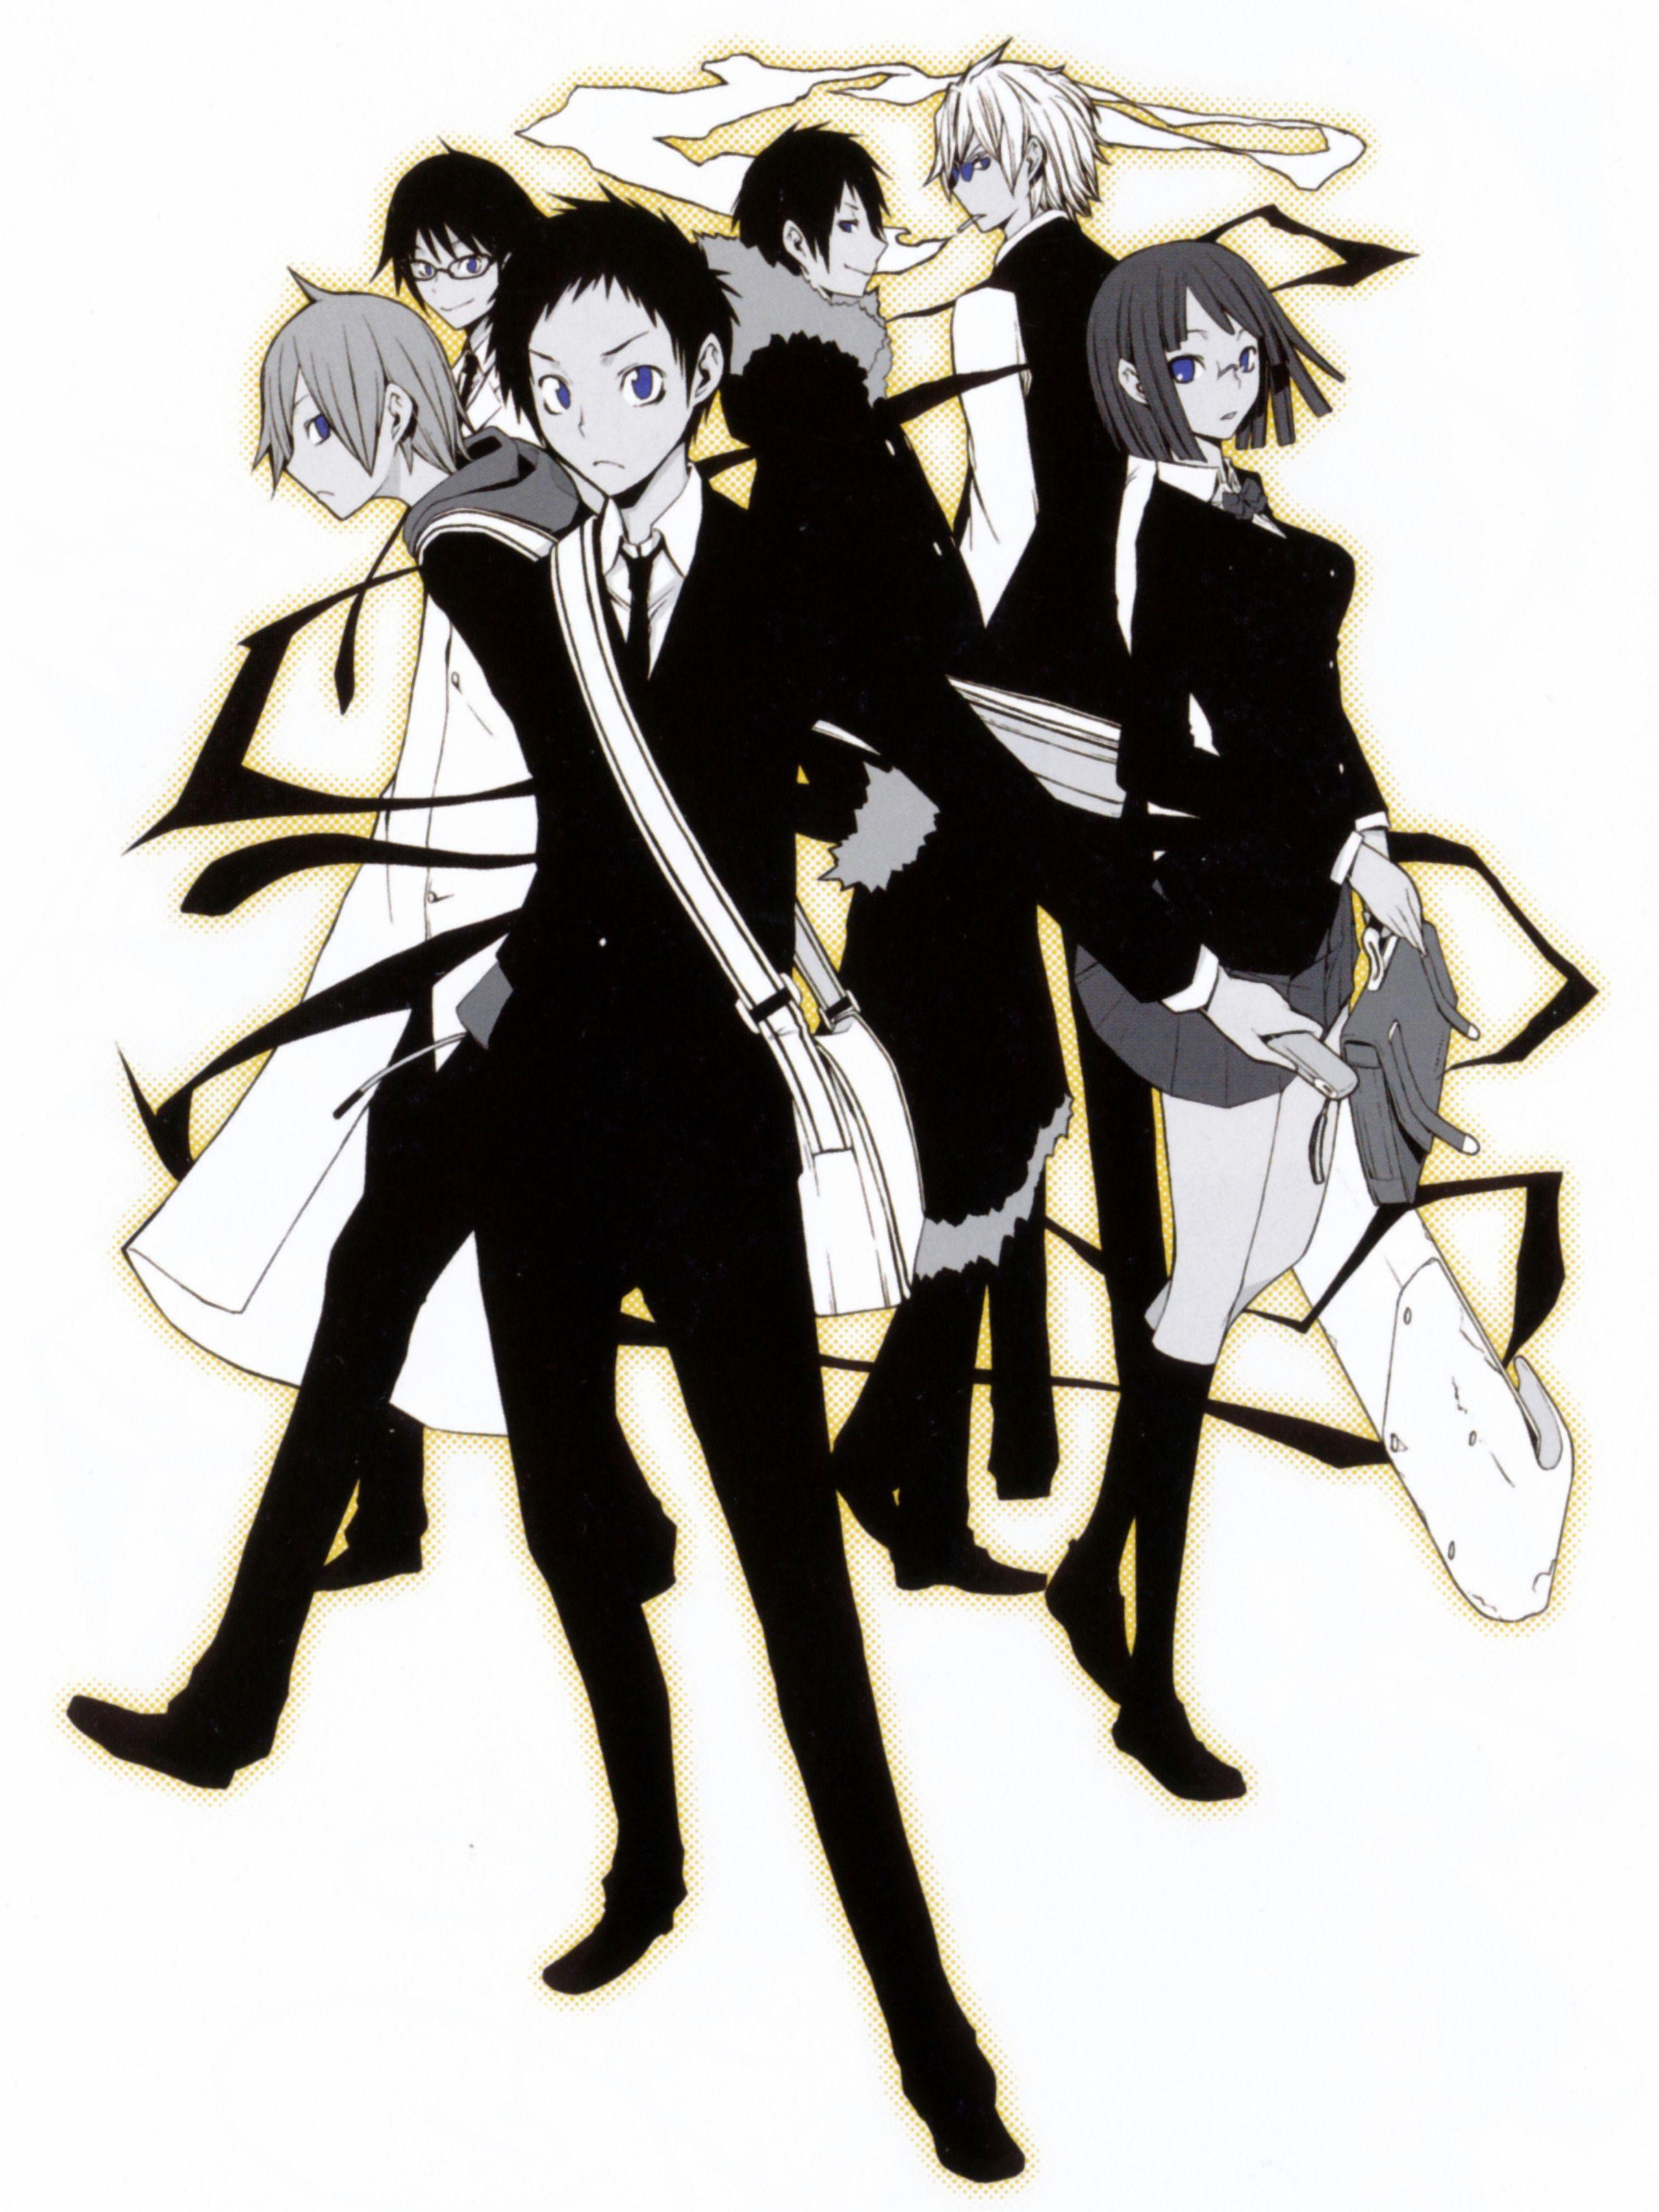 The cast of Durarara!! by Suzuhito Yasuda. キャラクターデザイン